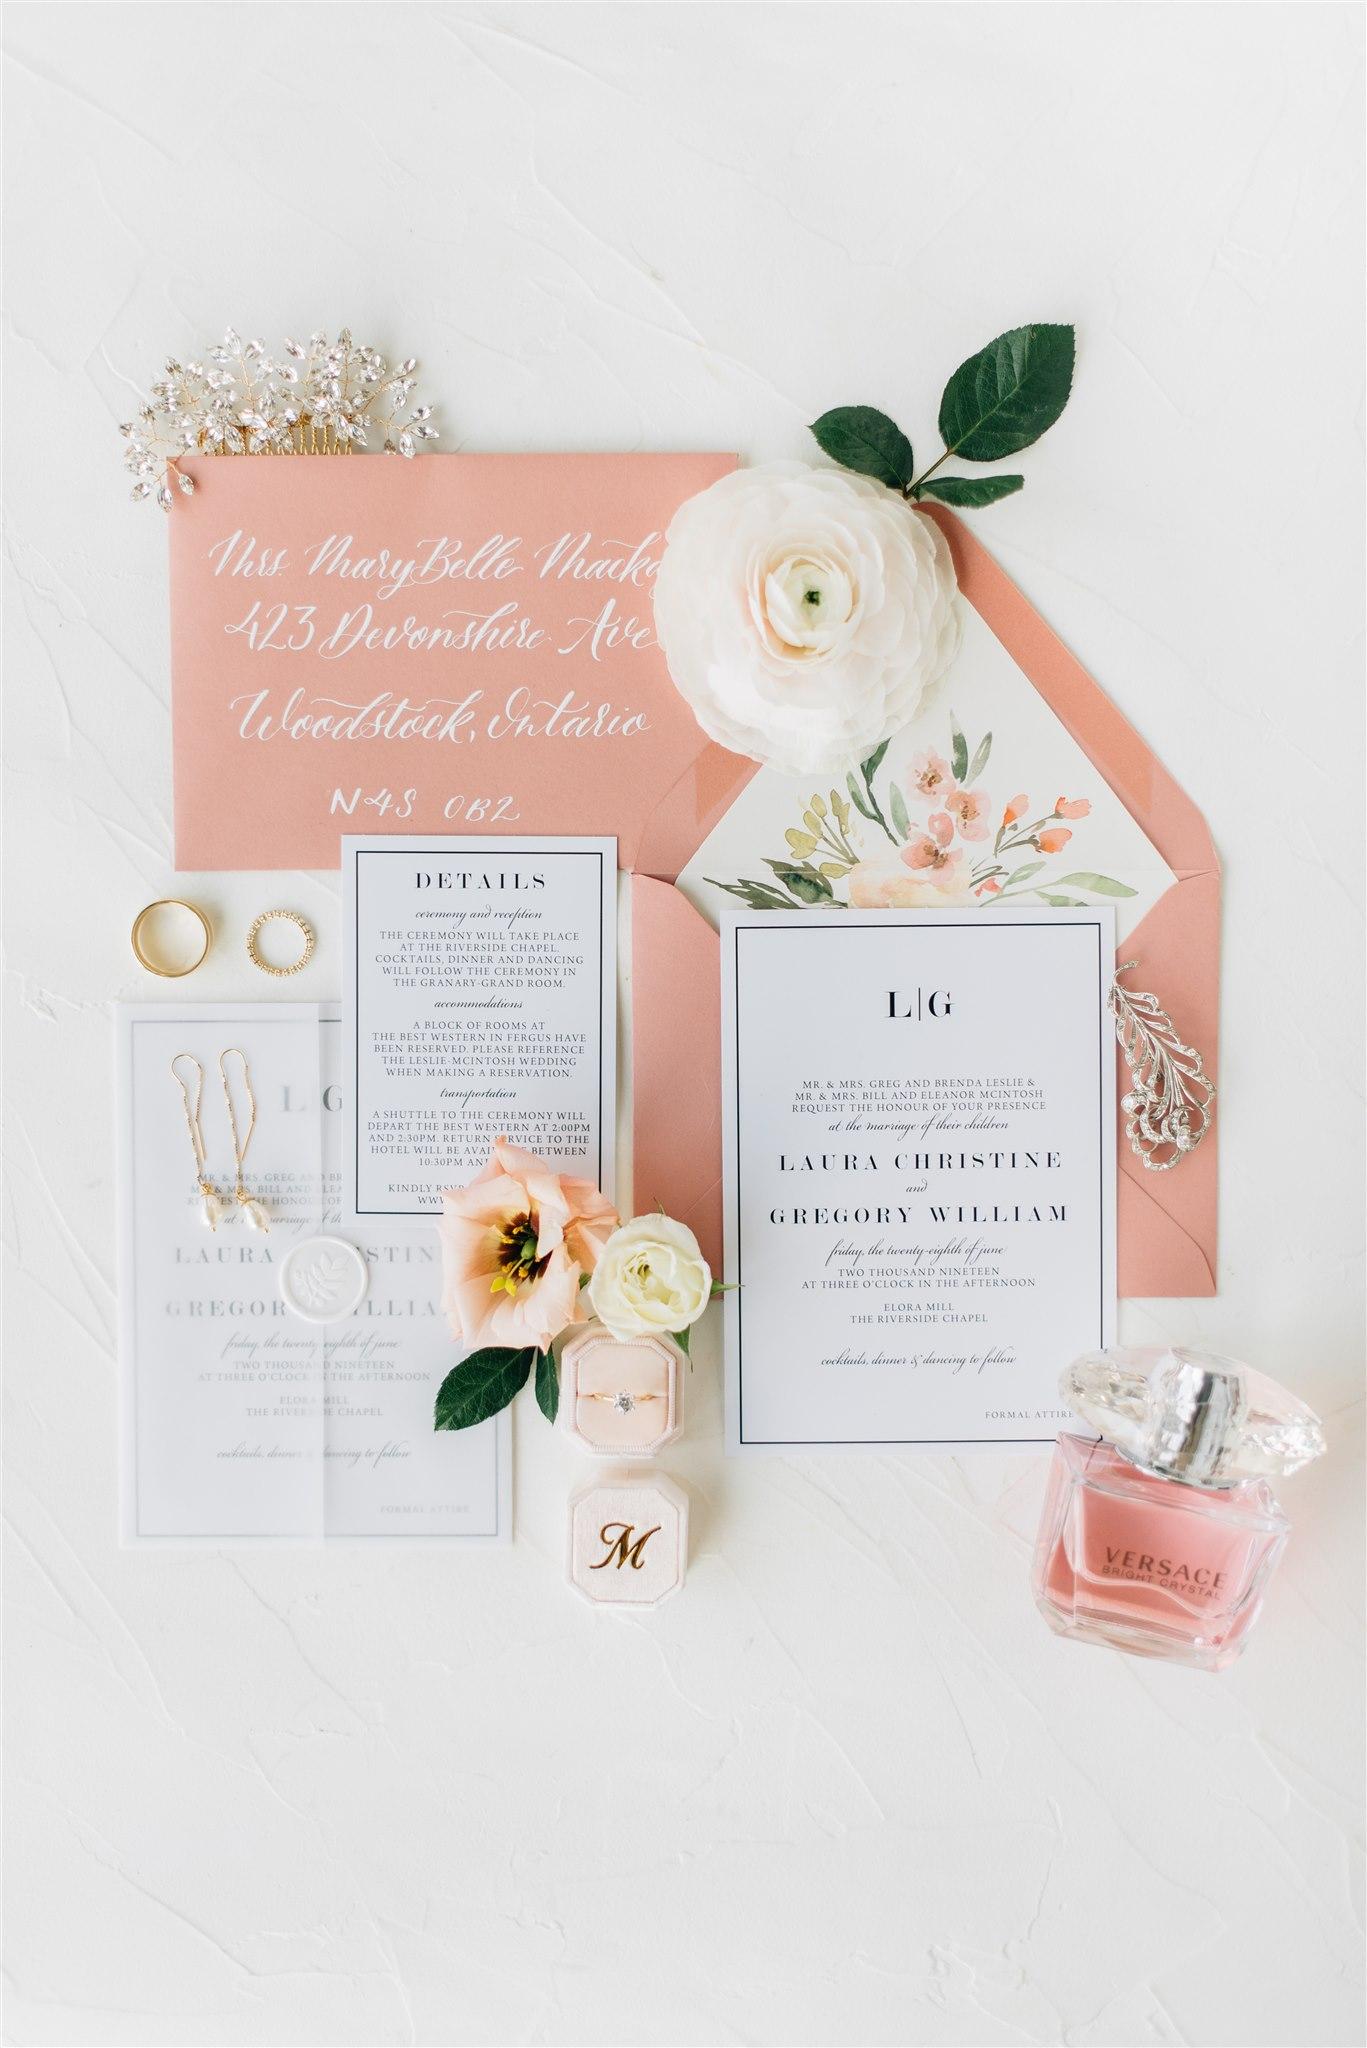 Complete wedding invitation flatlay on wedding day